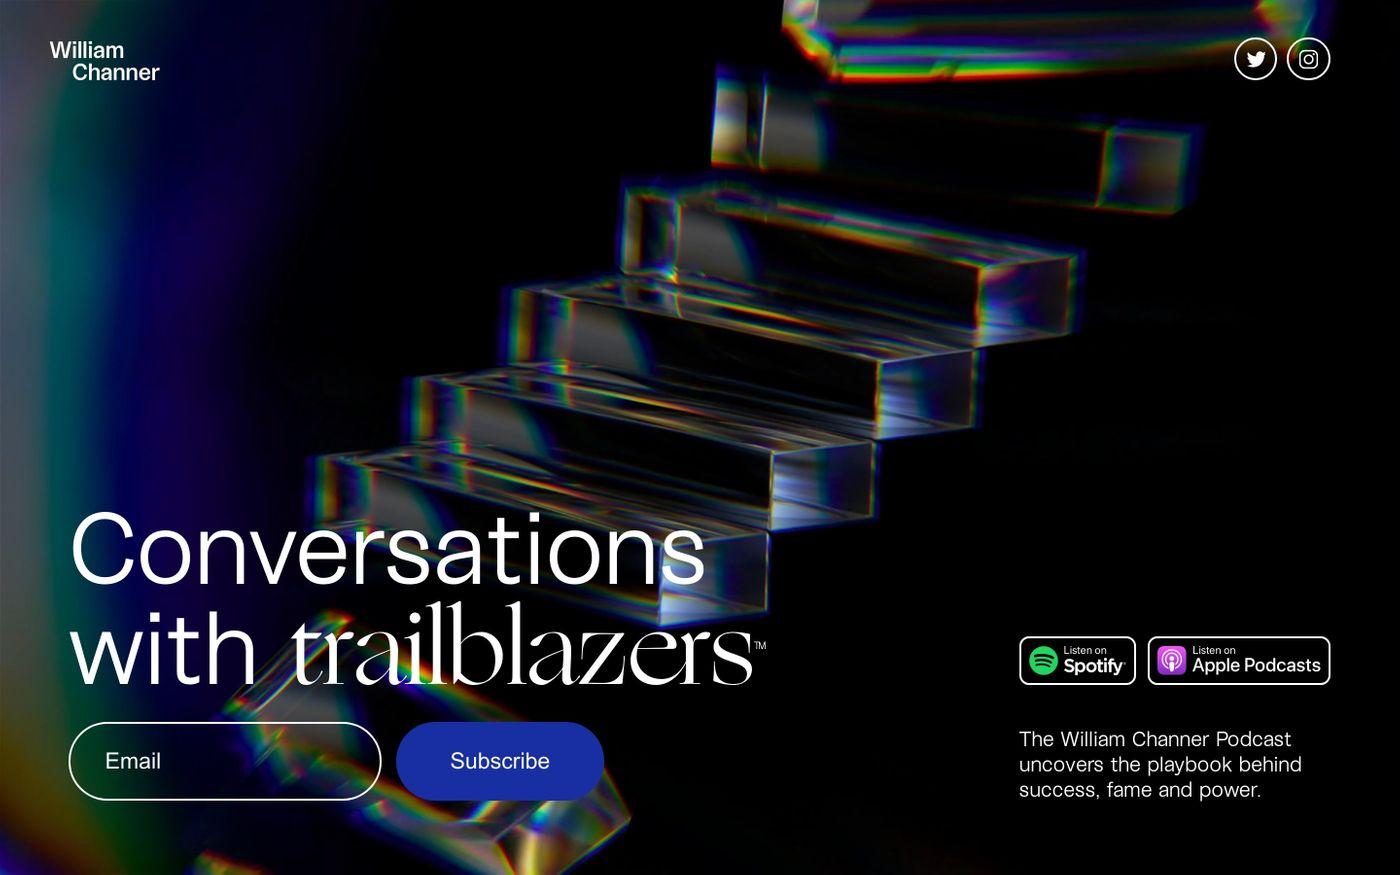 Screenshot of William Channer podcast website